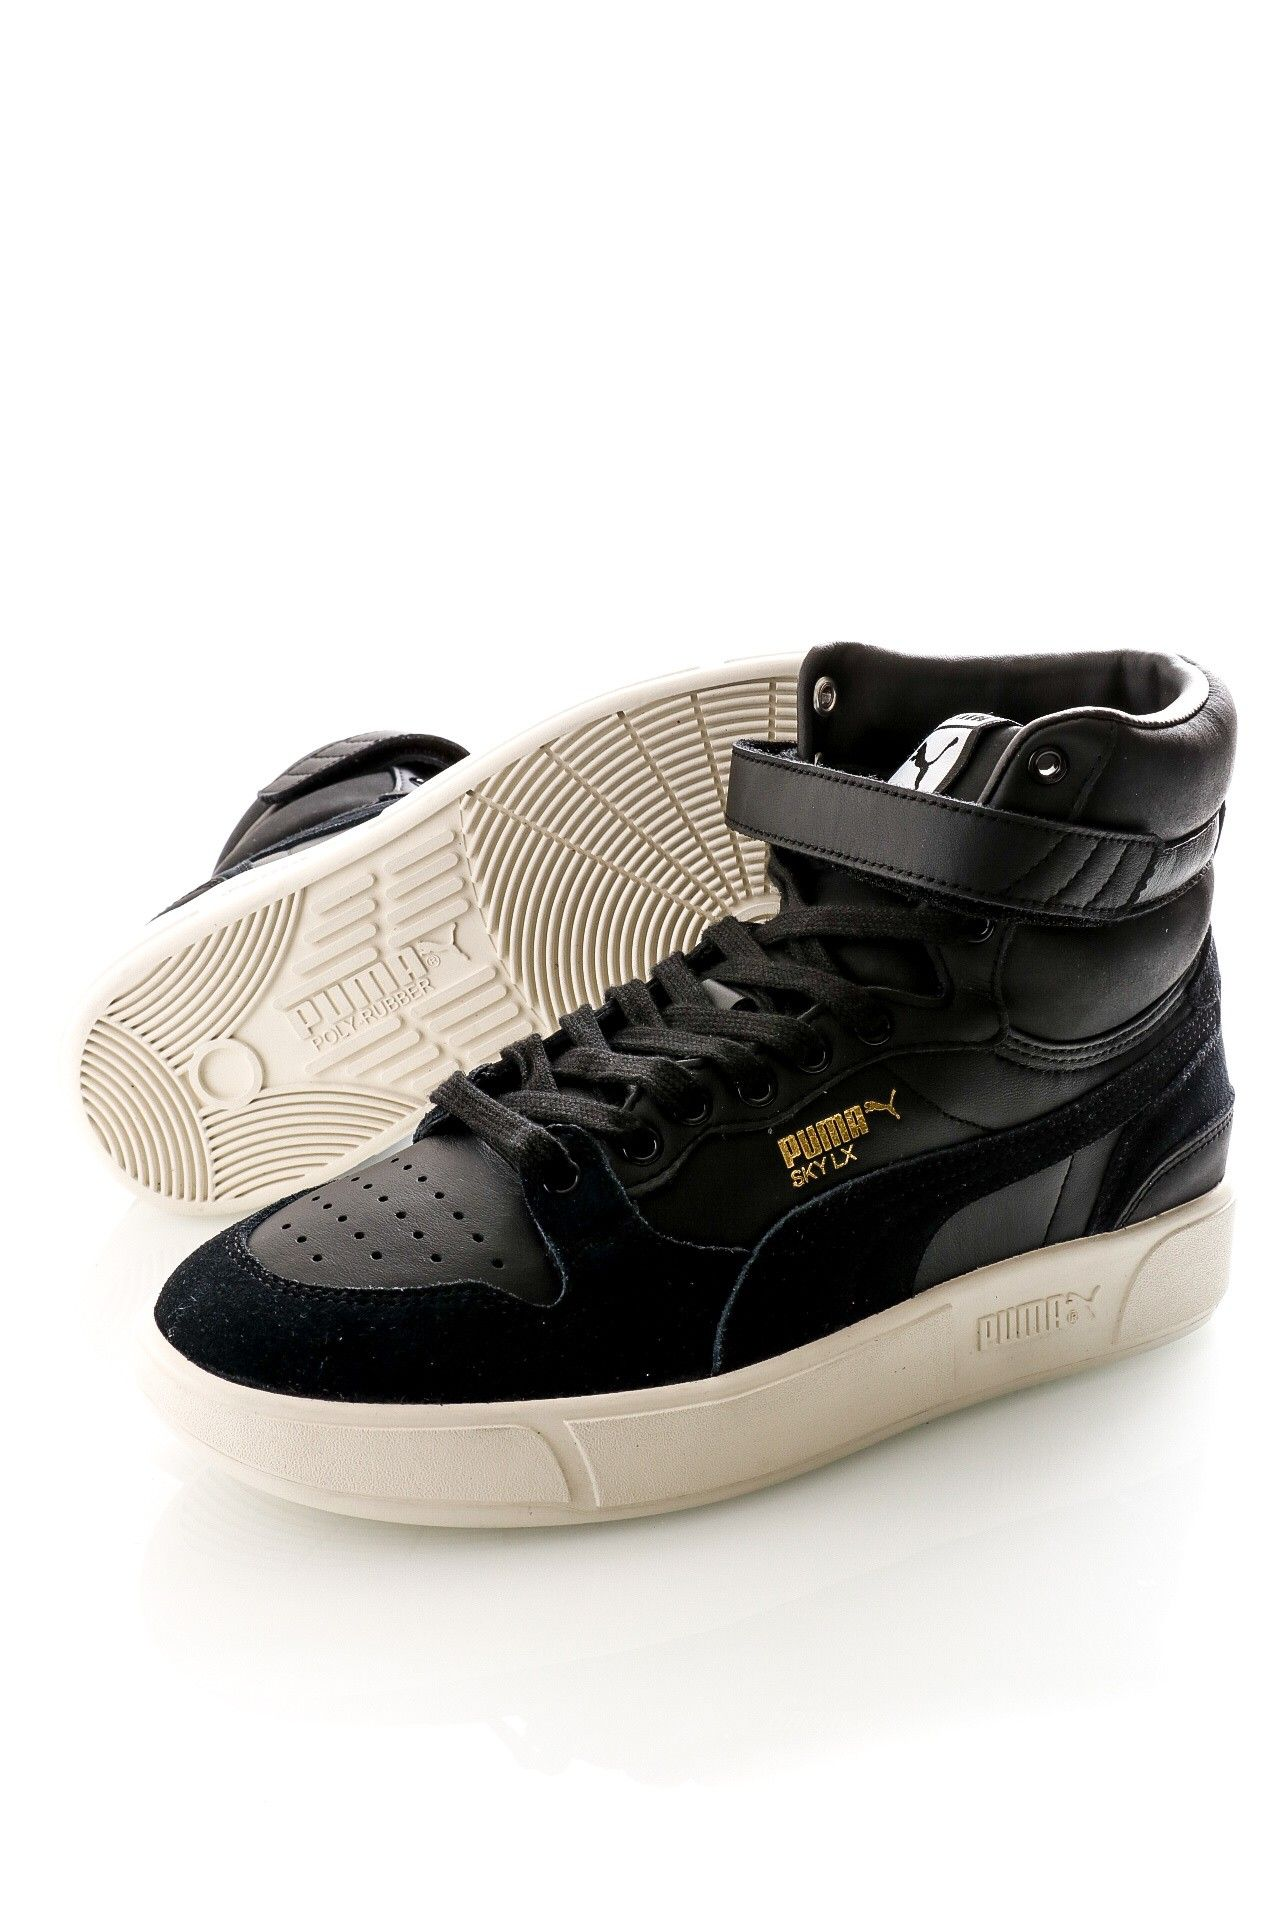 Afbeelding van Puma Sneakers Sky Lx Mid Lux Puma Black-Whisper White 372870 02